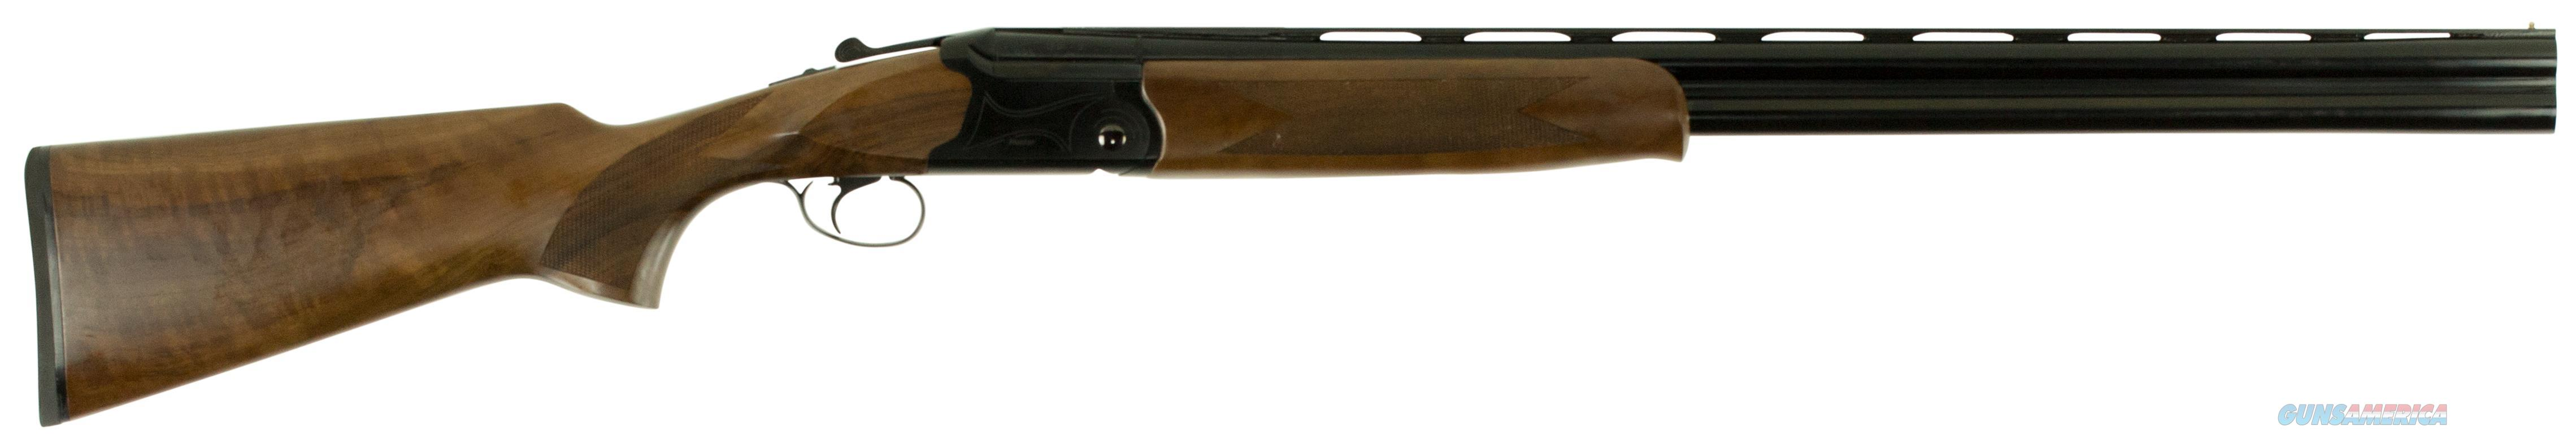 "Dickinson Oshunter Os Over/Under 12 Gauge 28"" 3"" Wood Stk Steel OSHUNTER  Guns > Rifles > D Misc Rifles"